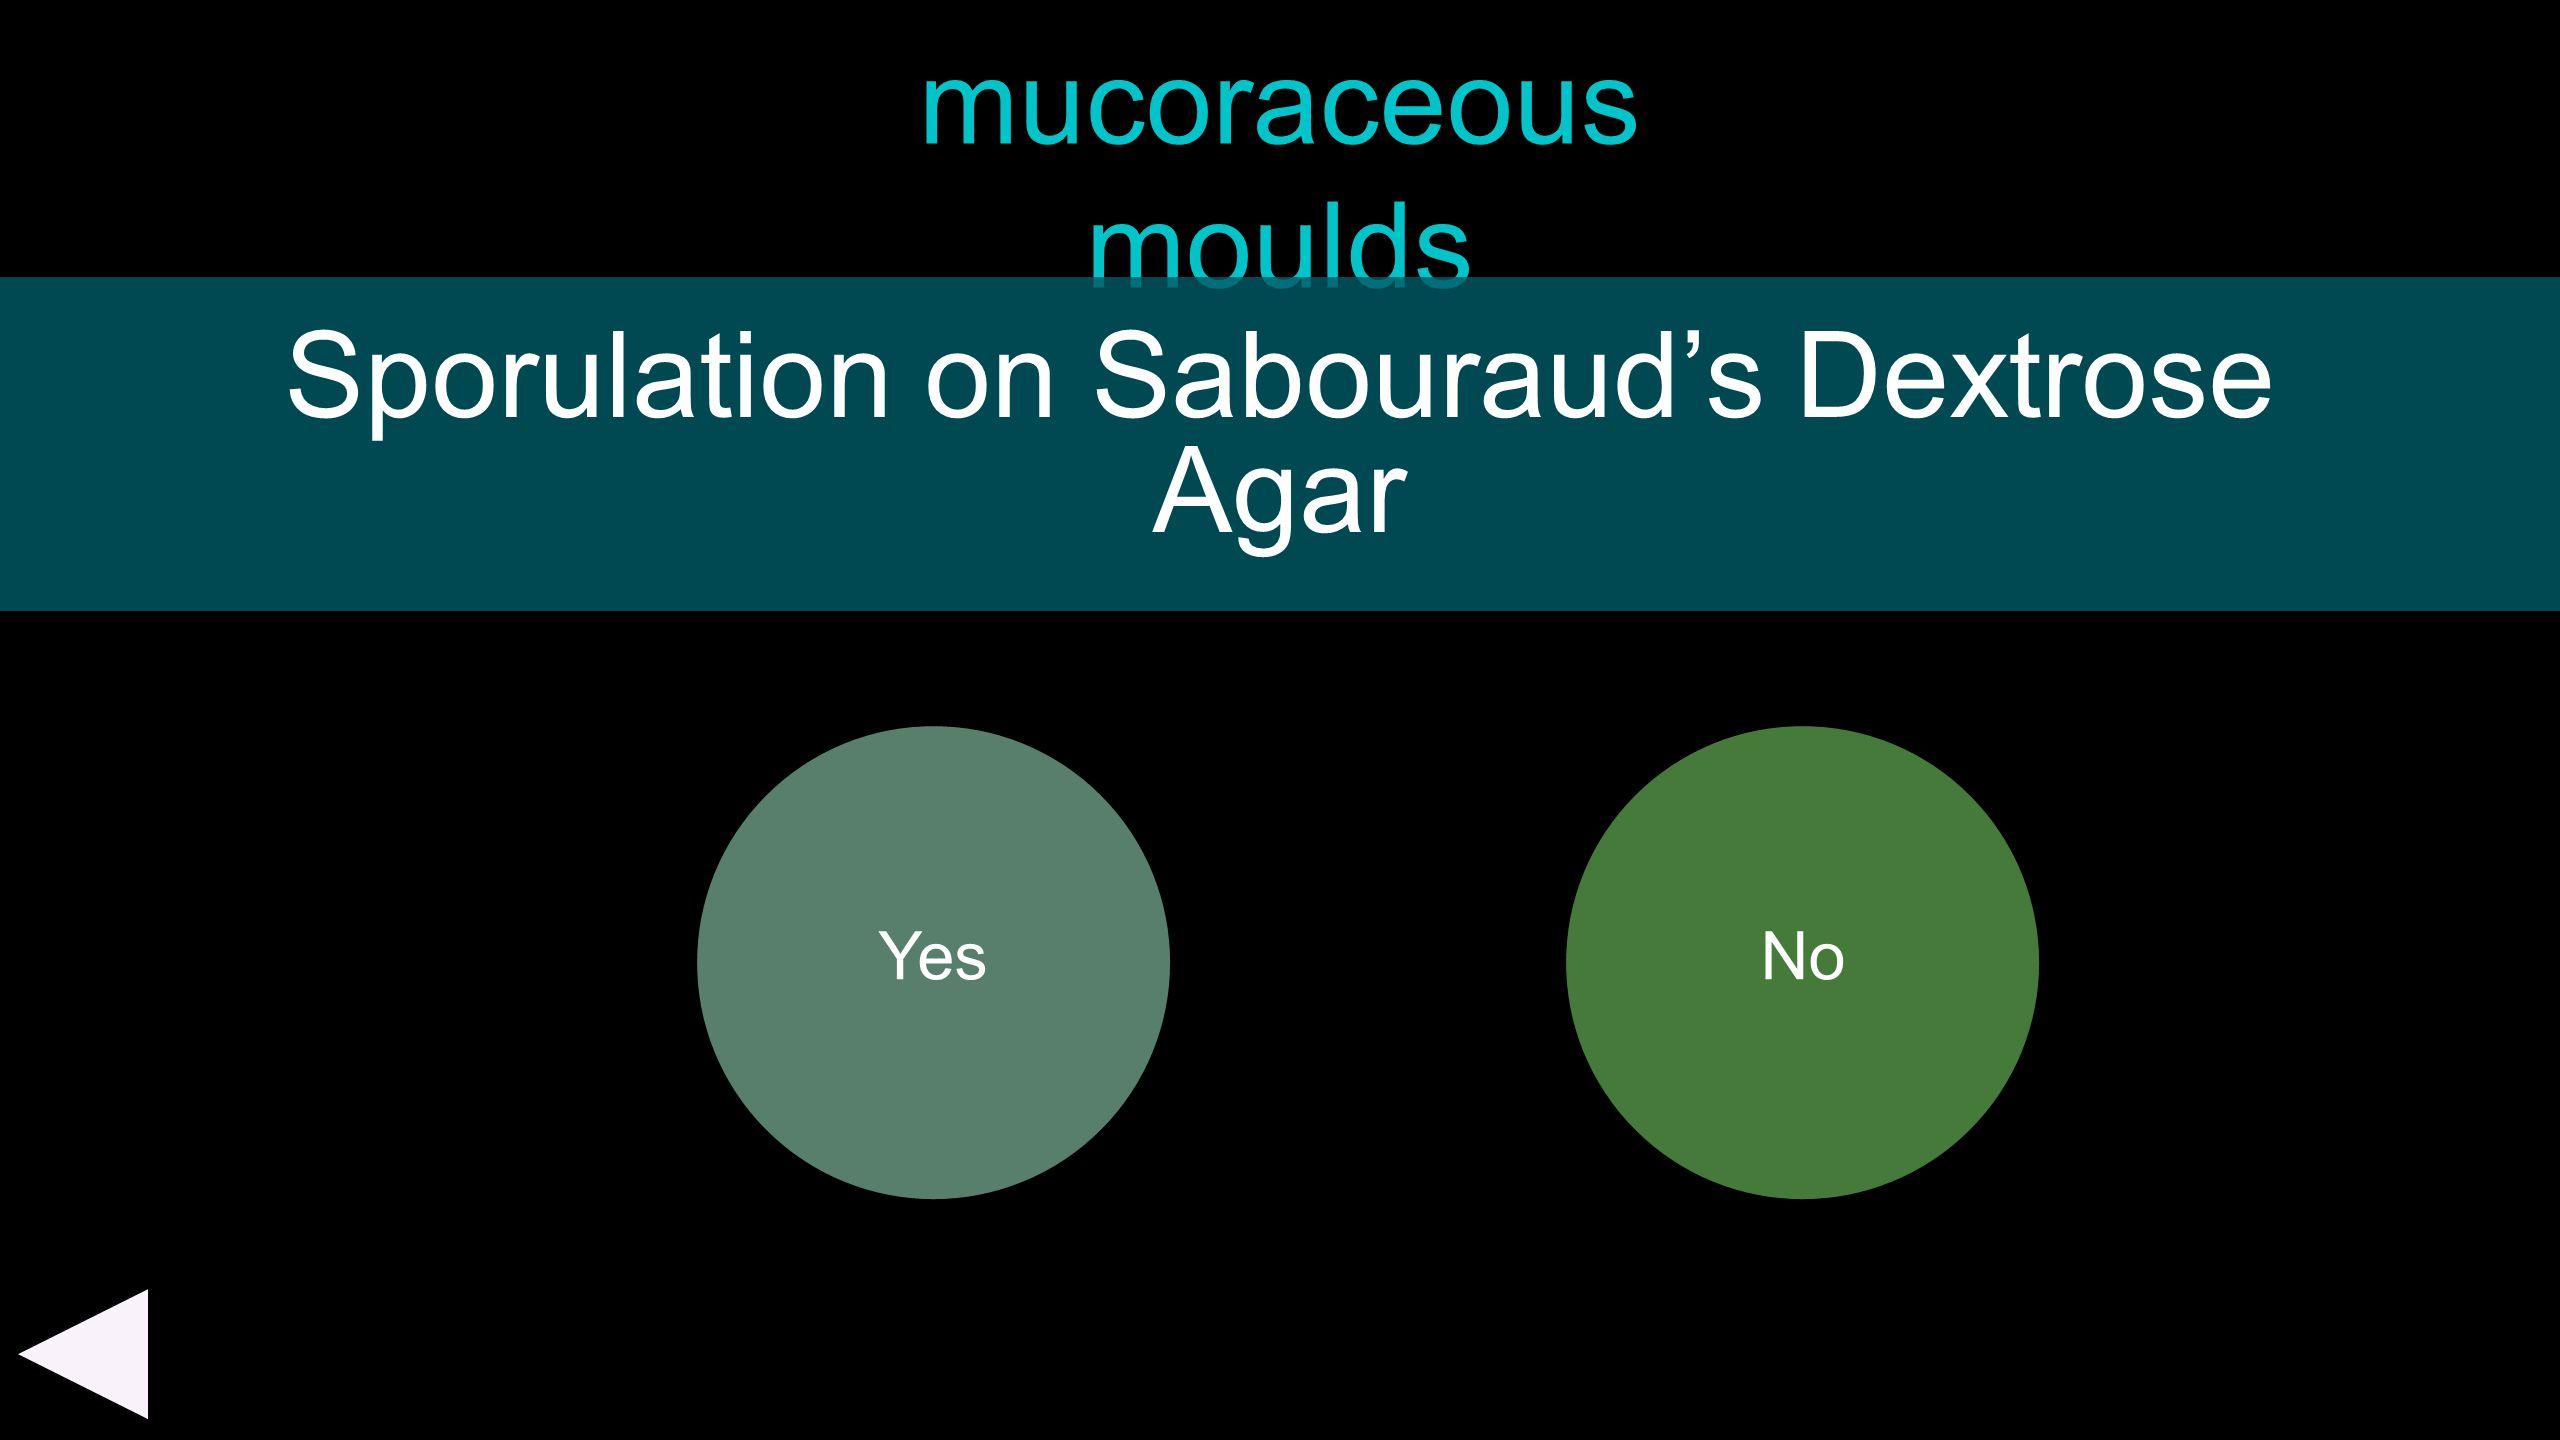 mucoraceous moulds Yes Sporulation on Sabouraud's Dextrose Agar No